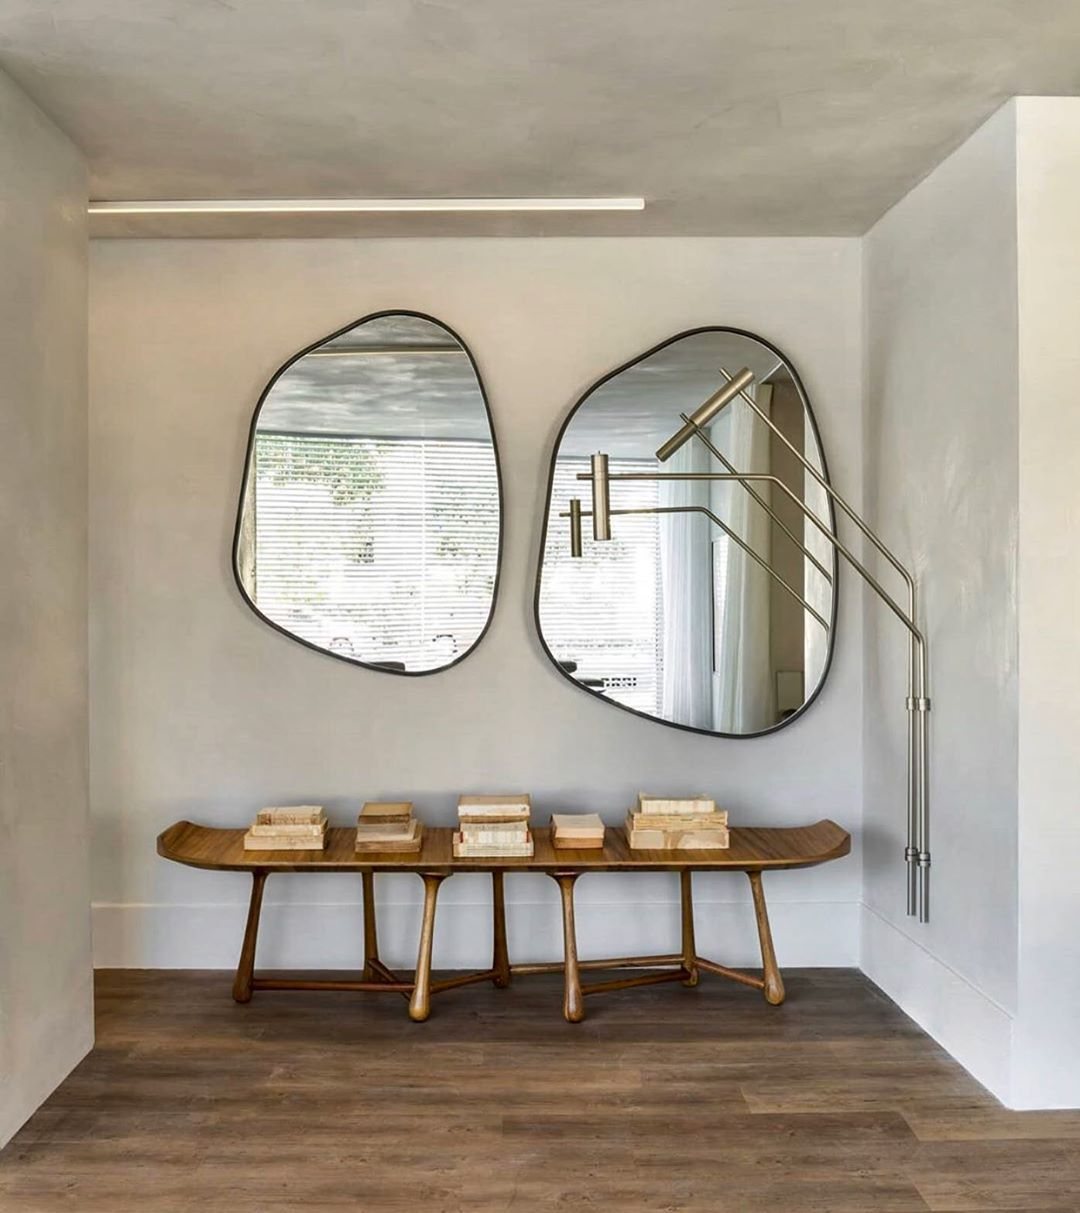 Andyvillasana On Instagram Vignette Design By Studioboscardincorsi Photography By Macarios Studiob Home Interior Design Home Decor Interior